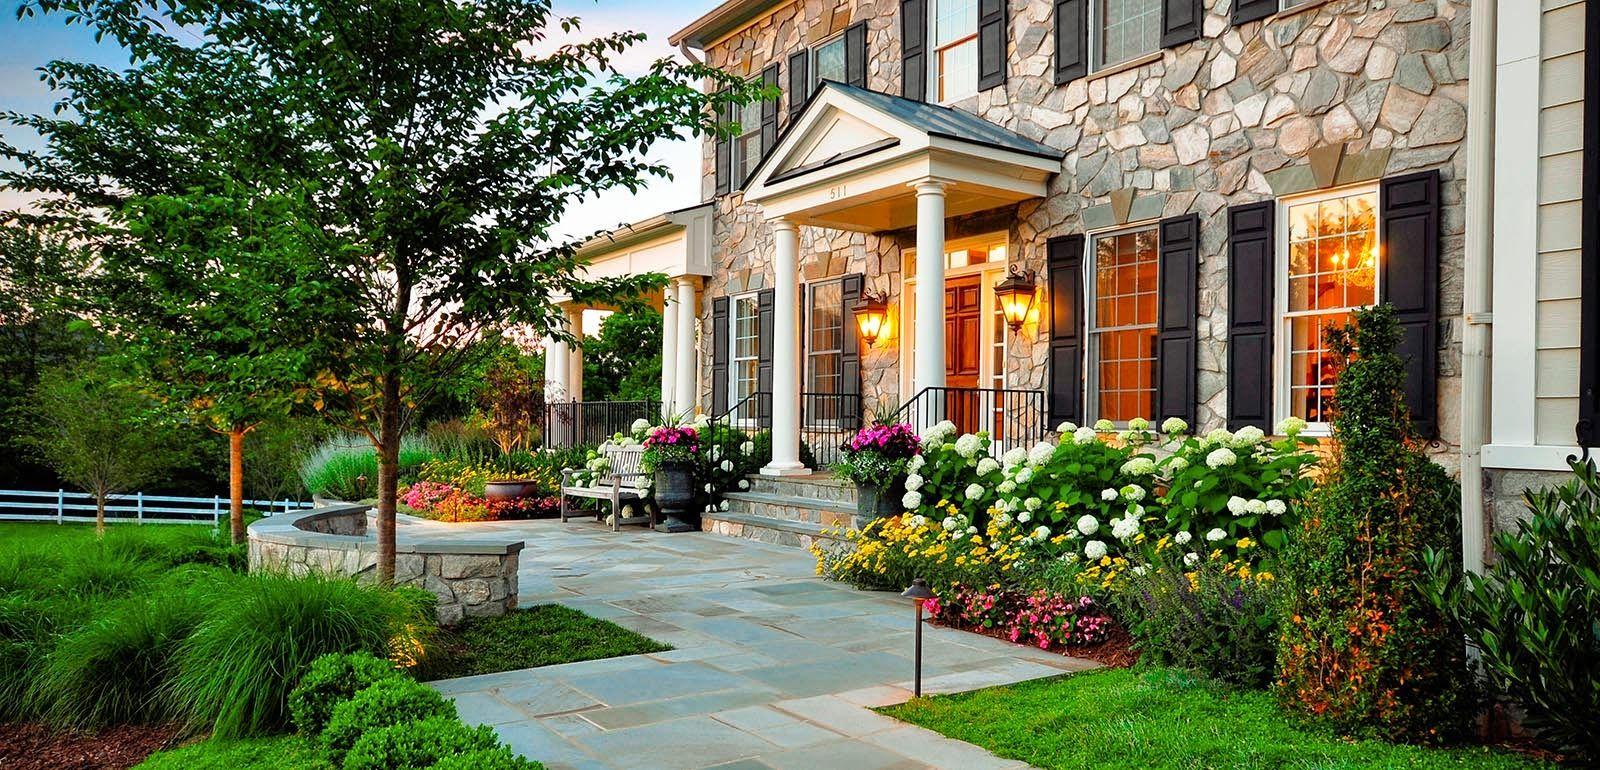 Jardines para frentes de casas peque as buscar con for Jardines hermosos pequenos